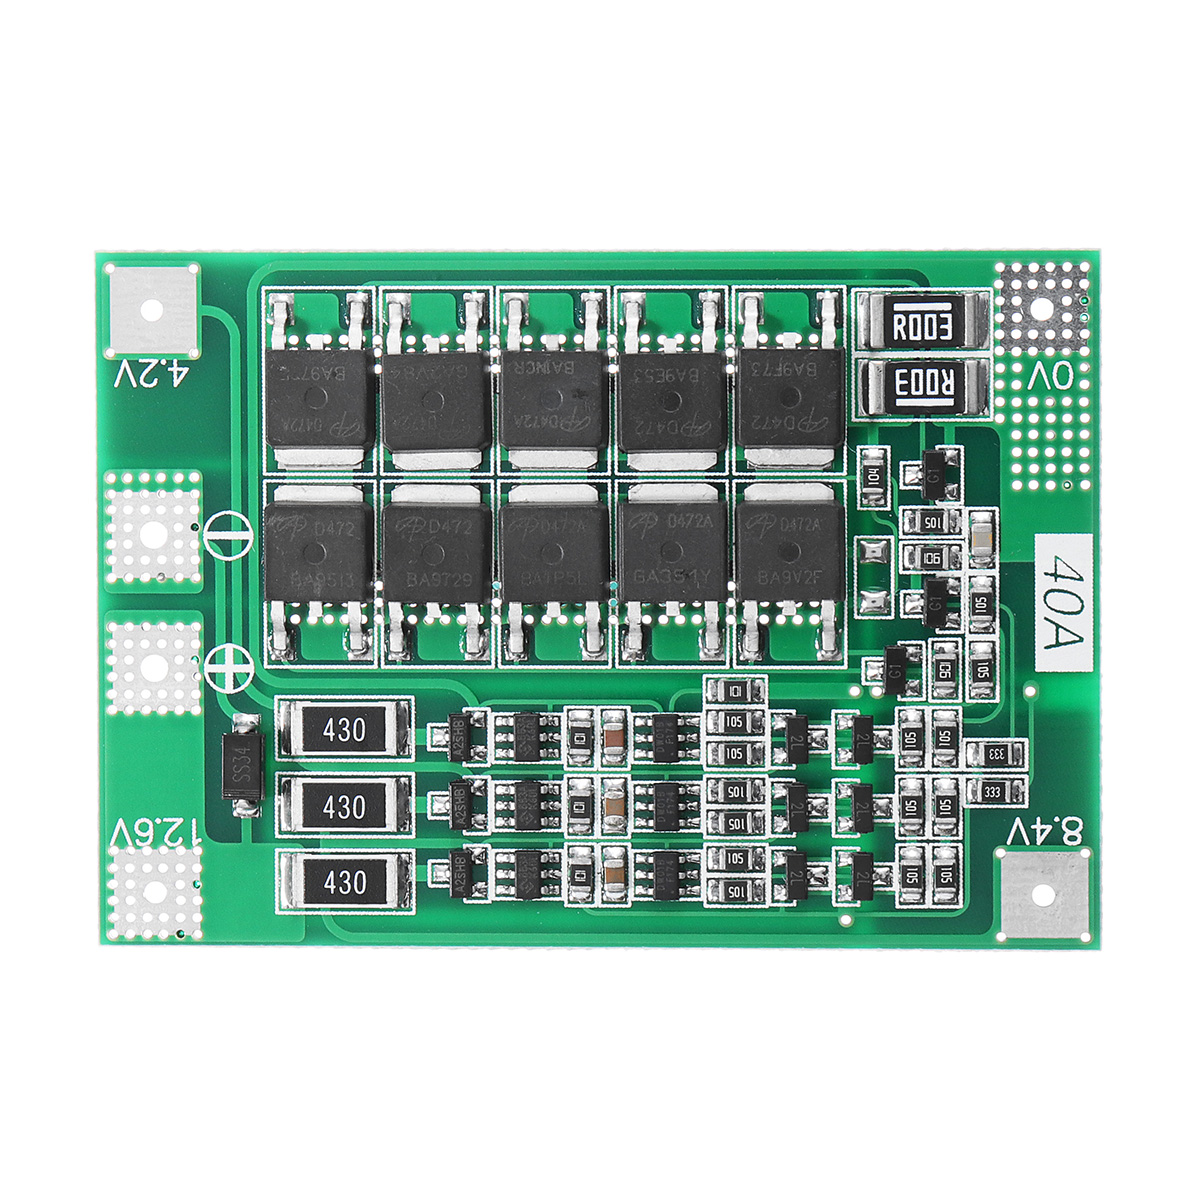 Батарея#and#nbsp;PCB BMS для защиты зарядного устройства для Дрель Мотор 11.1V 12.6V Lipo Cell Модуль с балансом